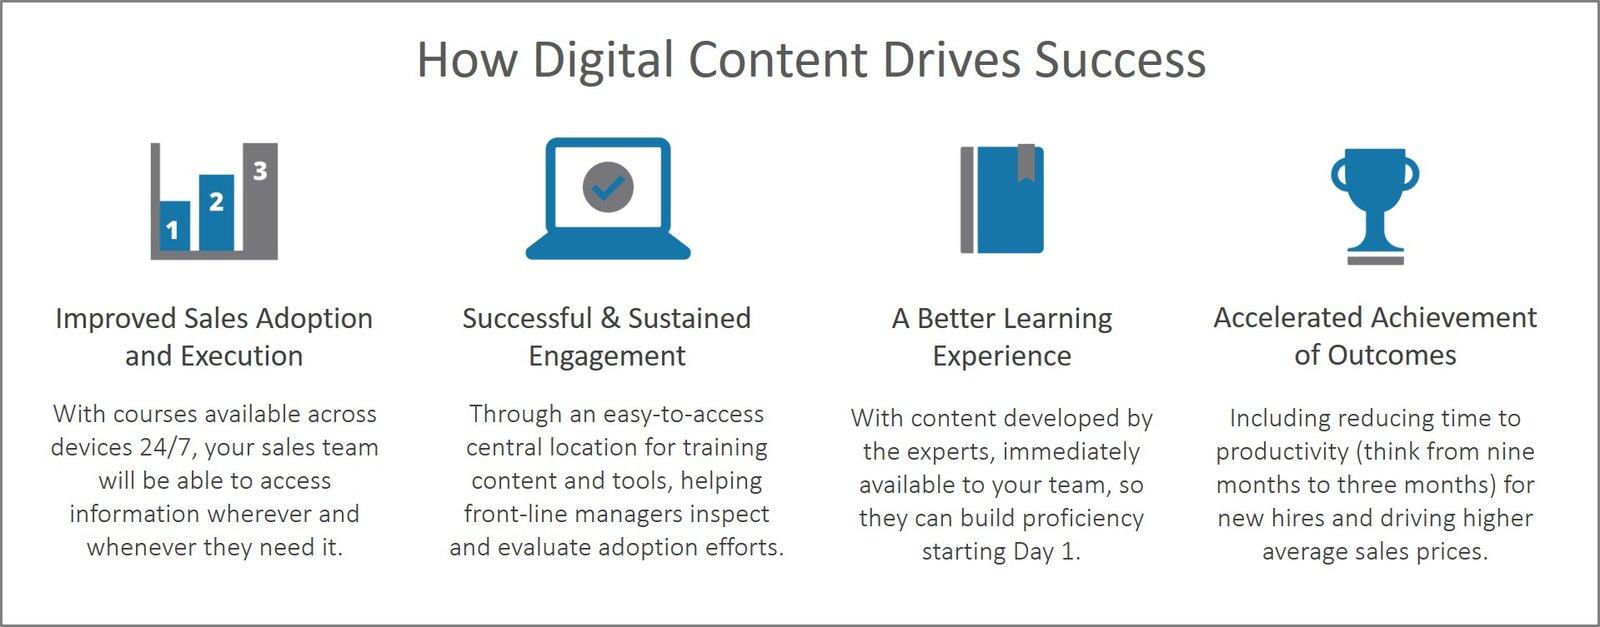 Digital Content Drives Success Graphic